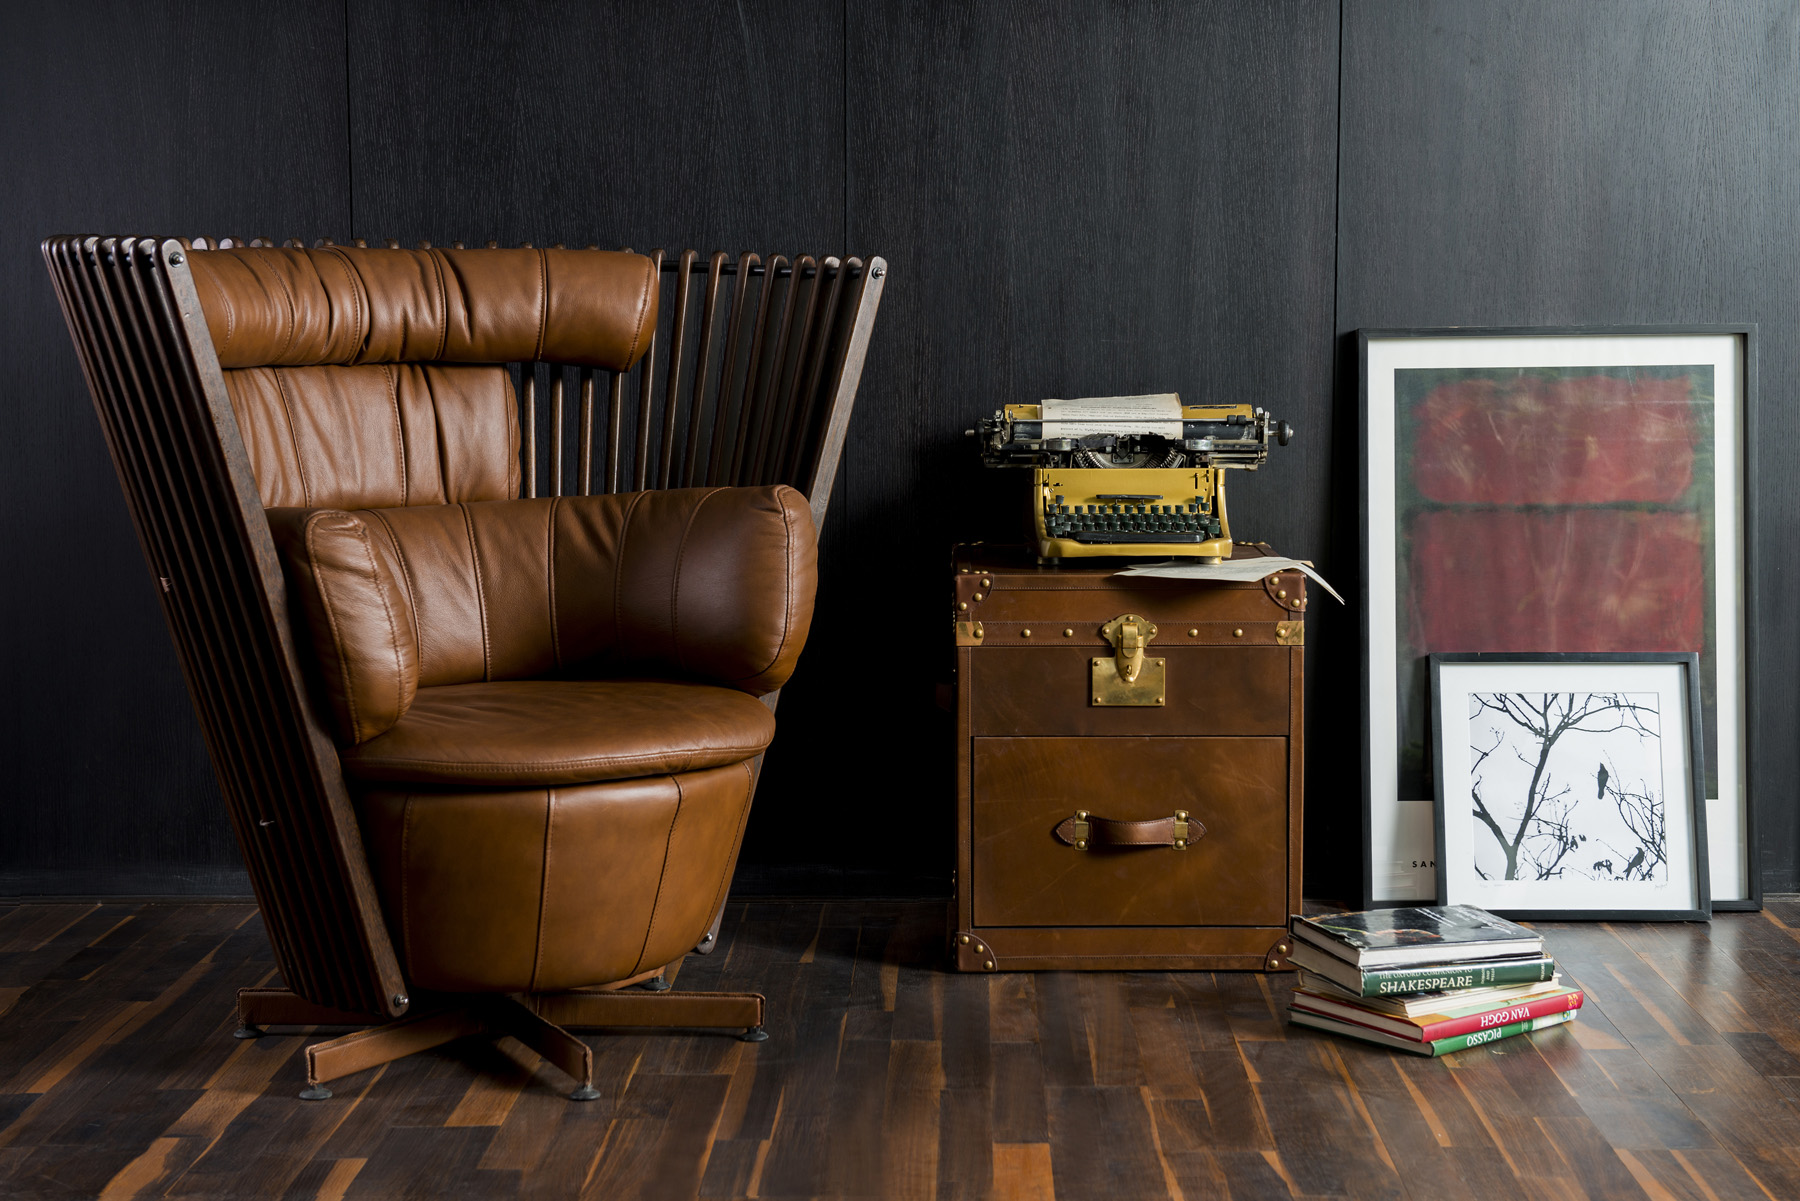 idus furnitures photography aditya mendiratta 2